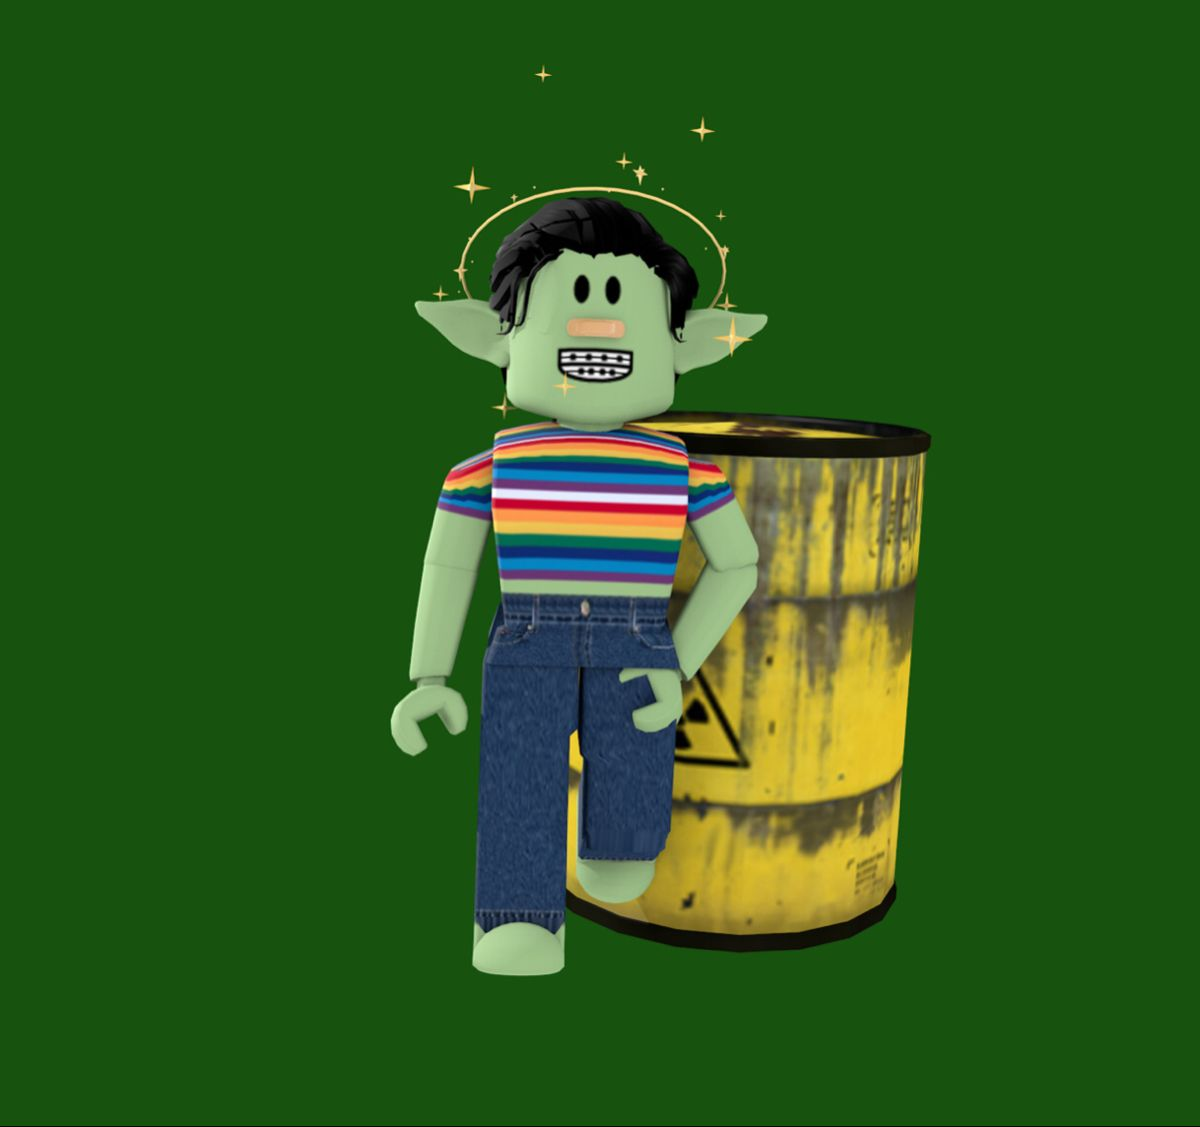 toxic waste goblin me in 2020 roblox goblin roblox